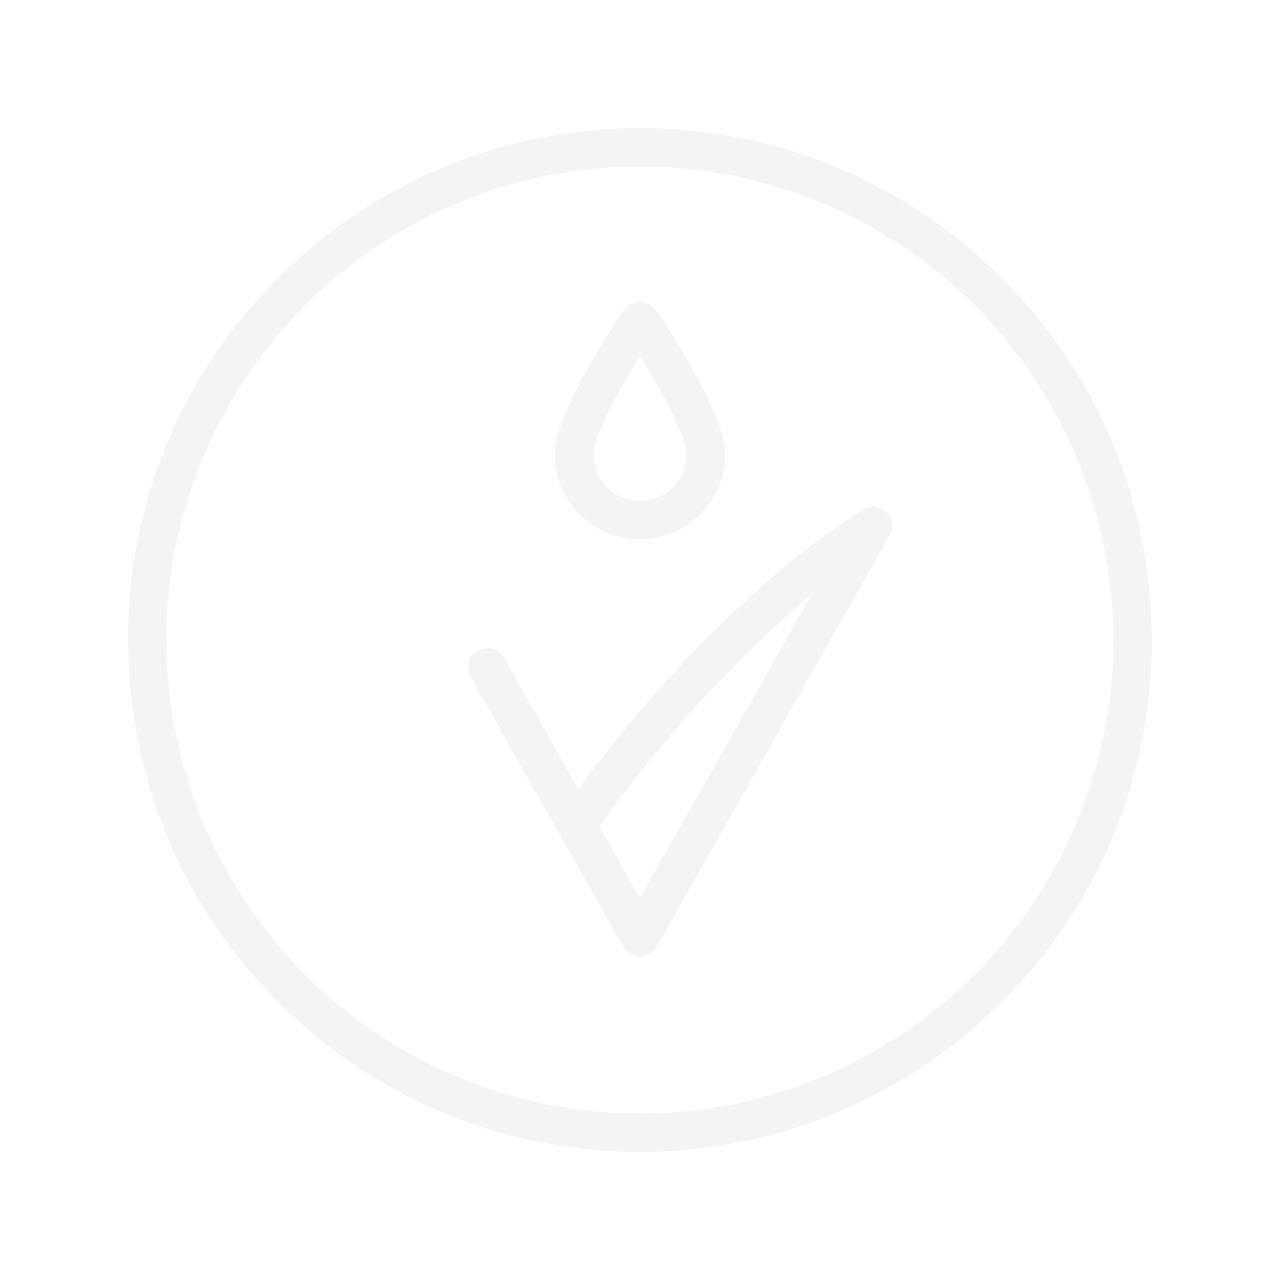 MINIGOLD Lovemark Star Lavender Gift Set